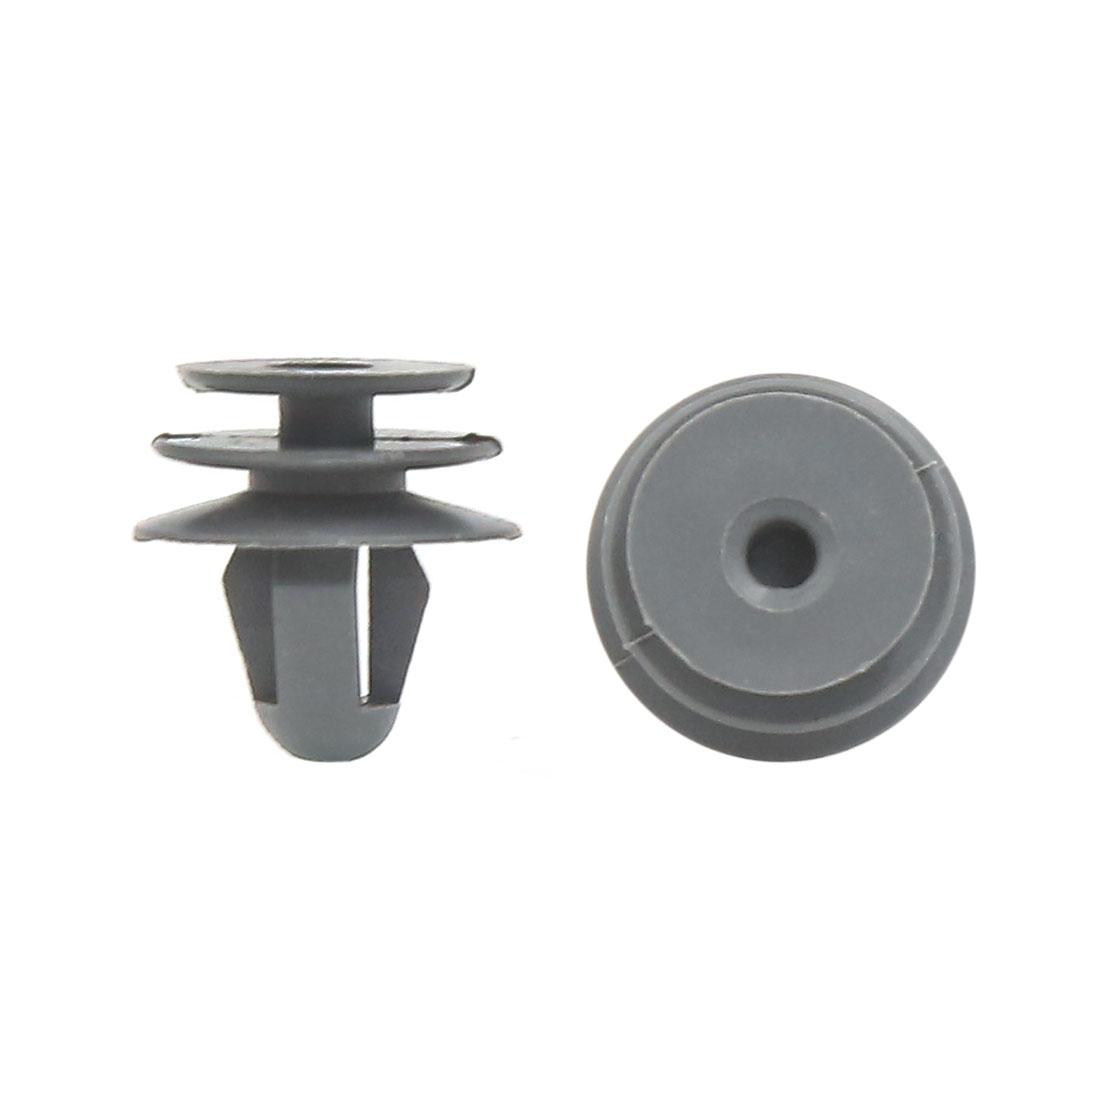 40 Pcs Gray Bumper Fender 8mm Hole Plastic Rivets Trim Fasteners for Car Auto